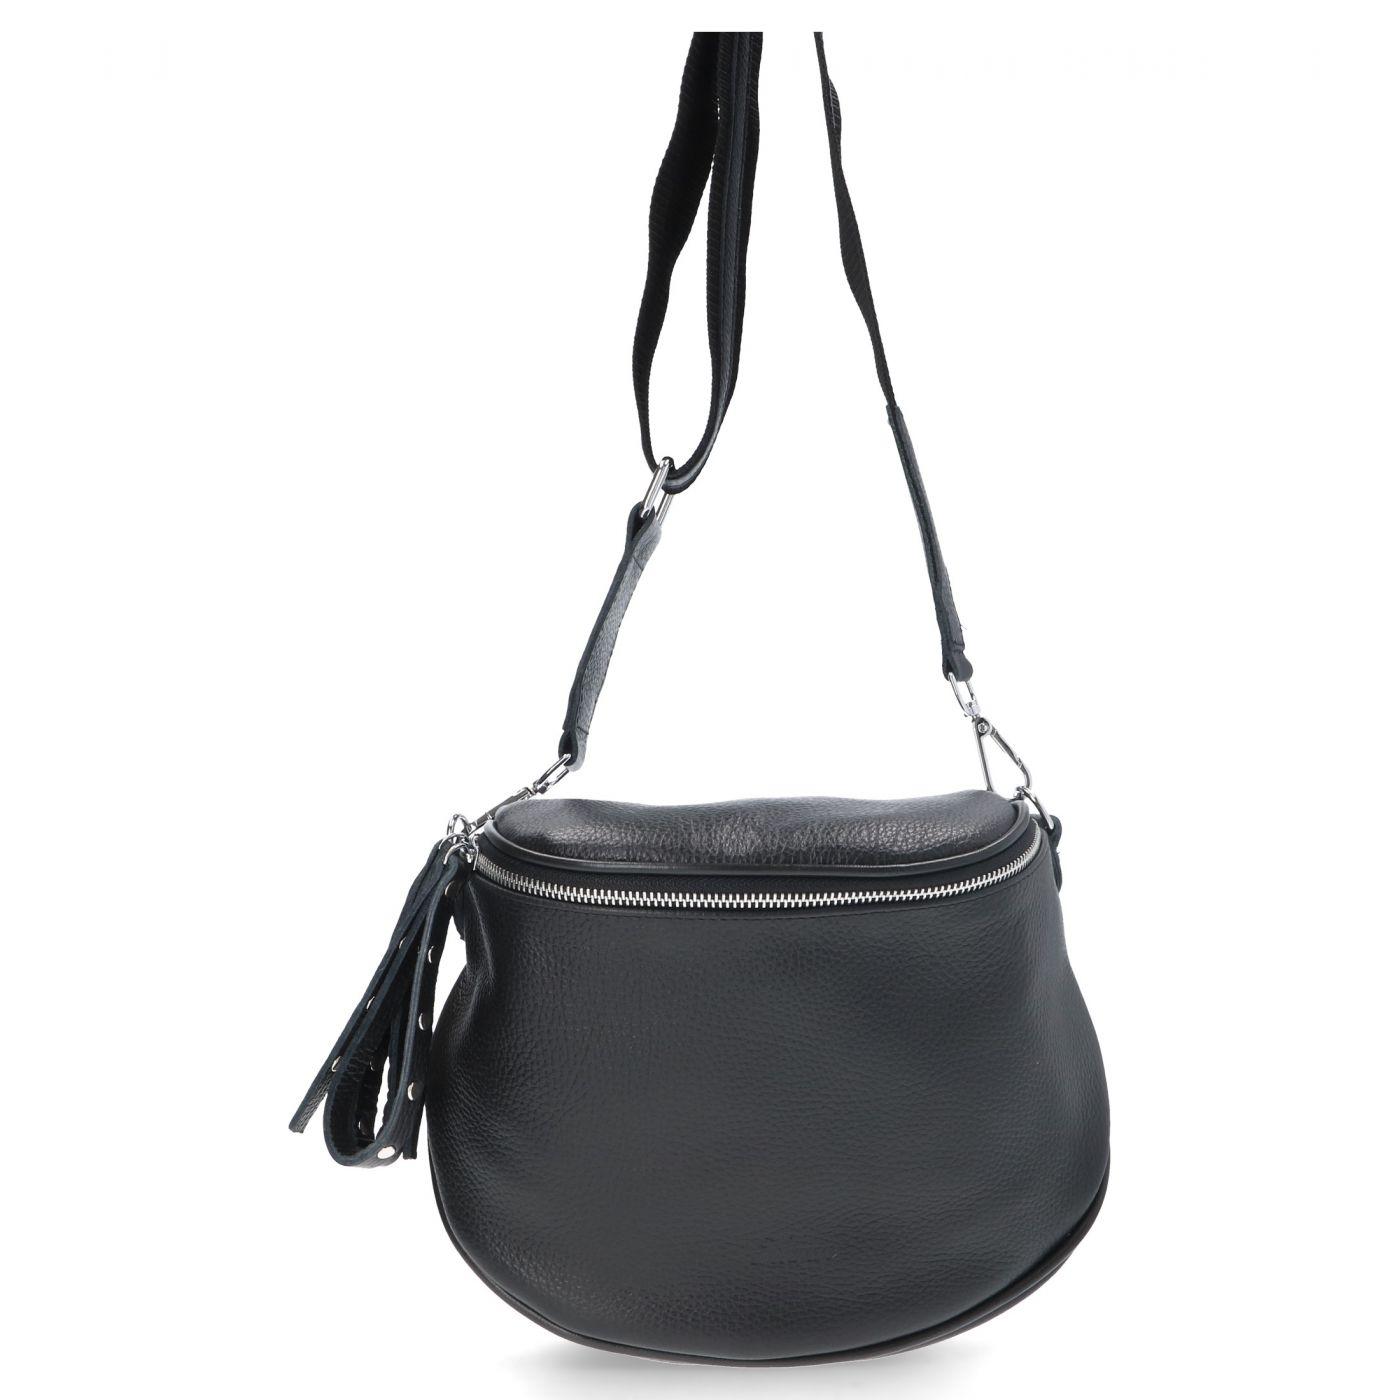 Karen Woman's Handbag Kr001-Palmira